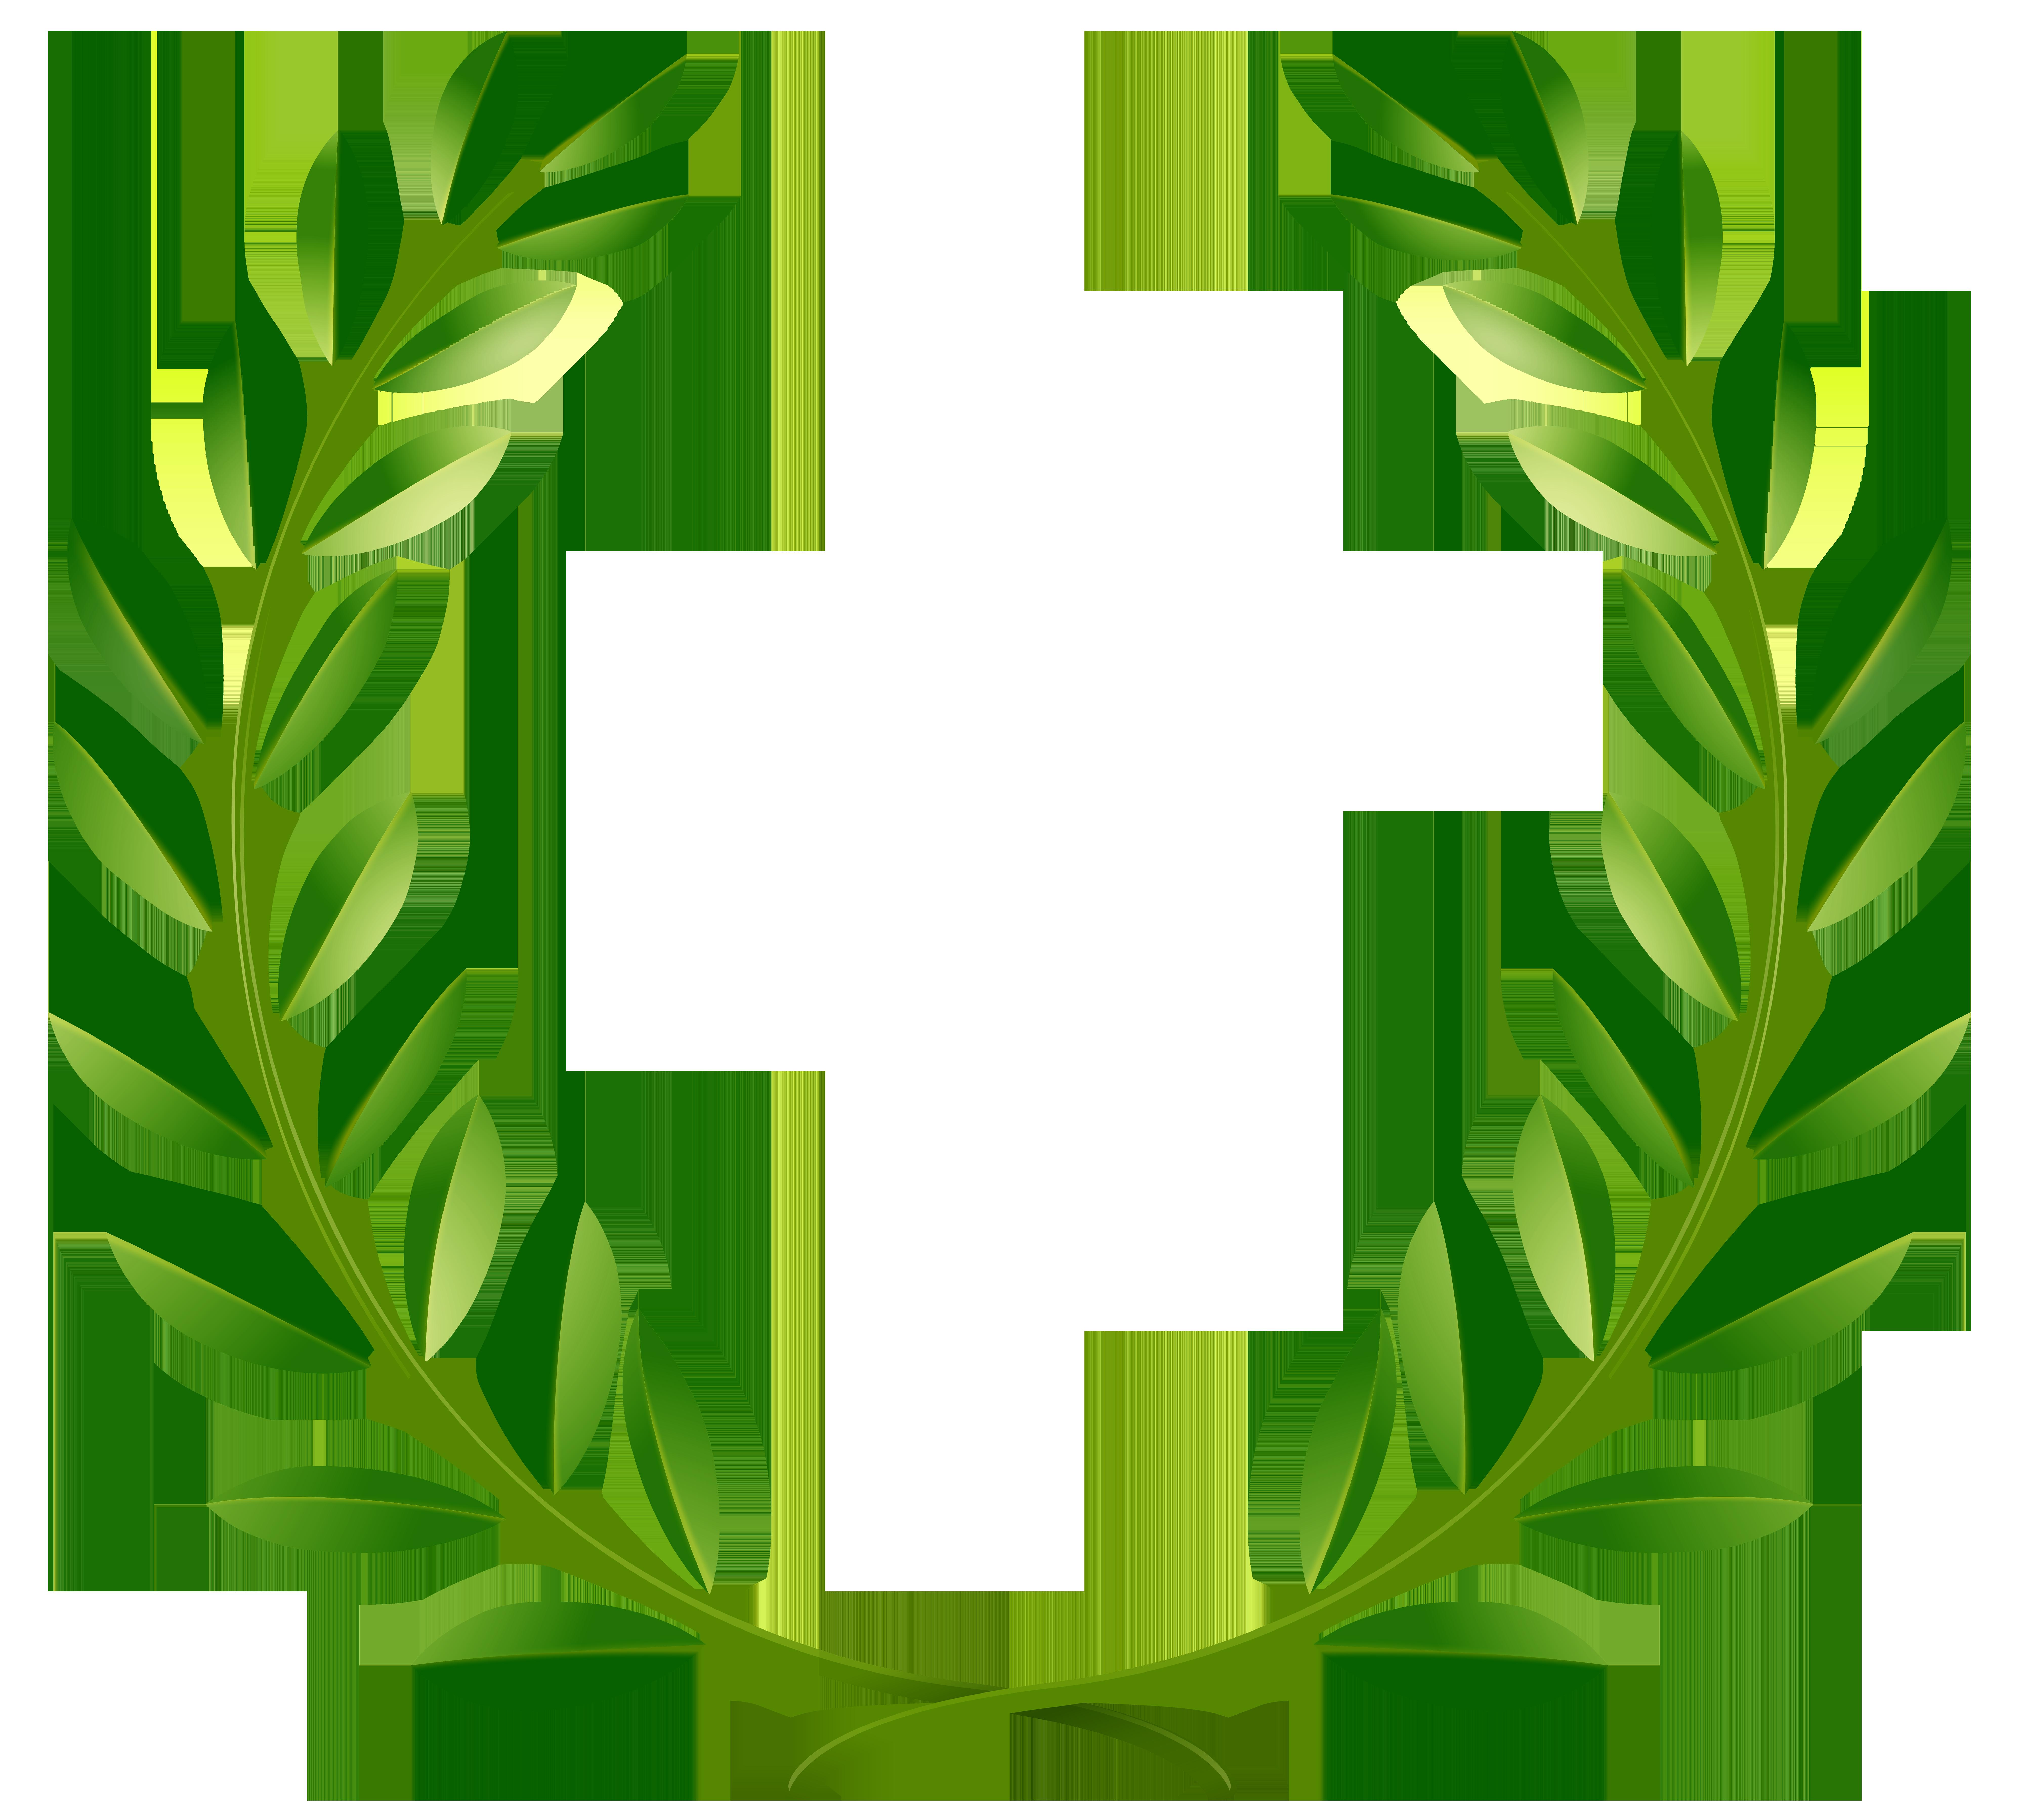 Laurel tree clipart banner royalty free download Green Laurel Leaves PNG Clip Art Image | Gallery Yopriceville ... banner royalty free download